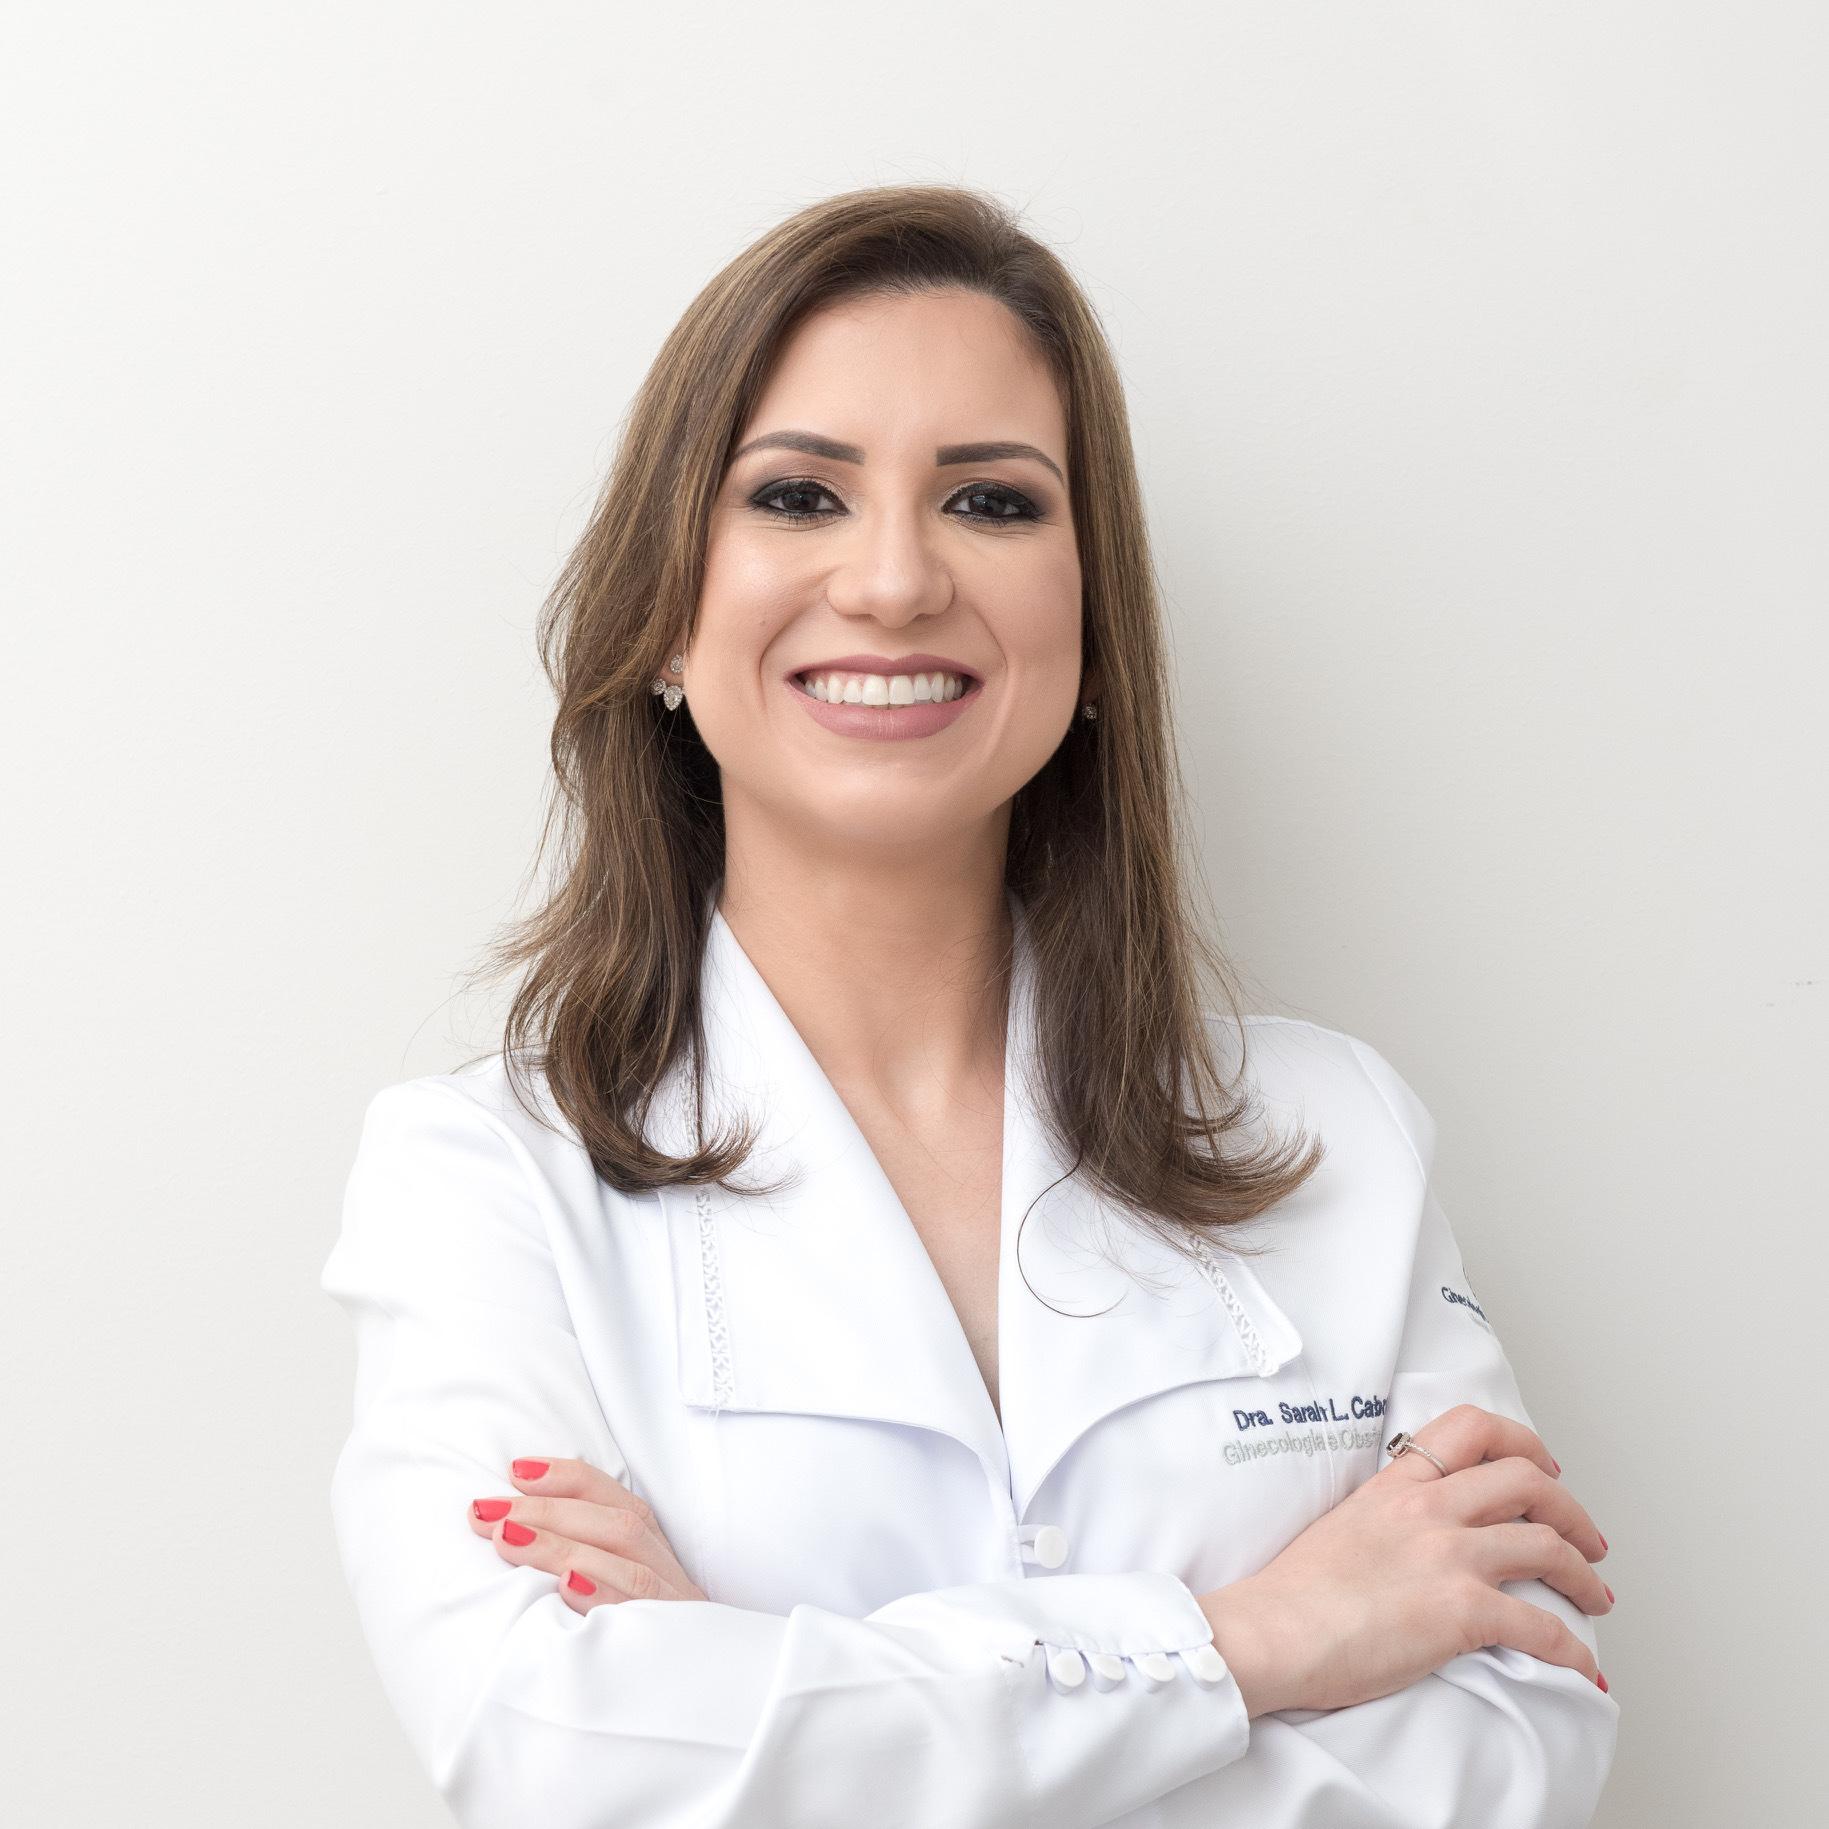 Sarah Louise Cabral